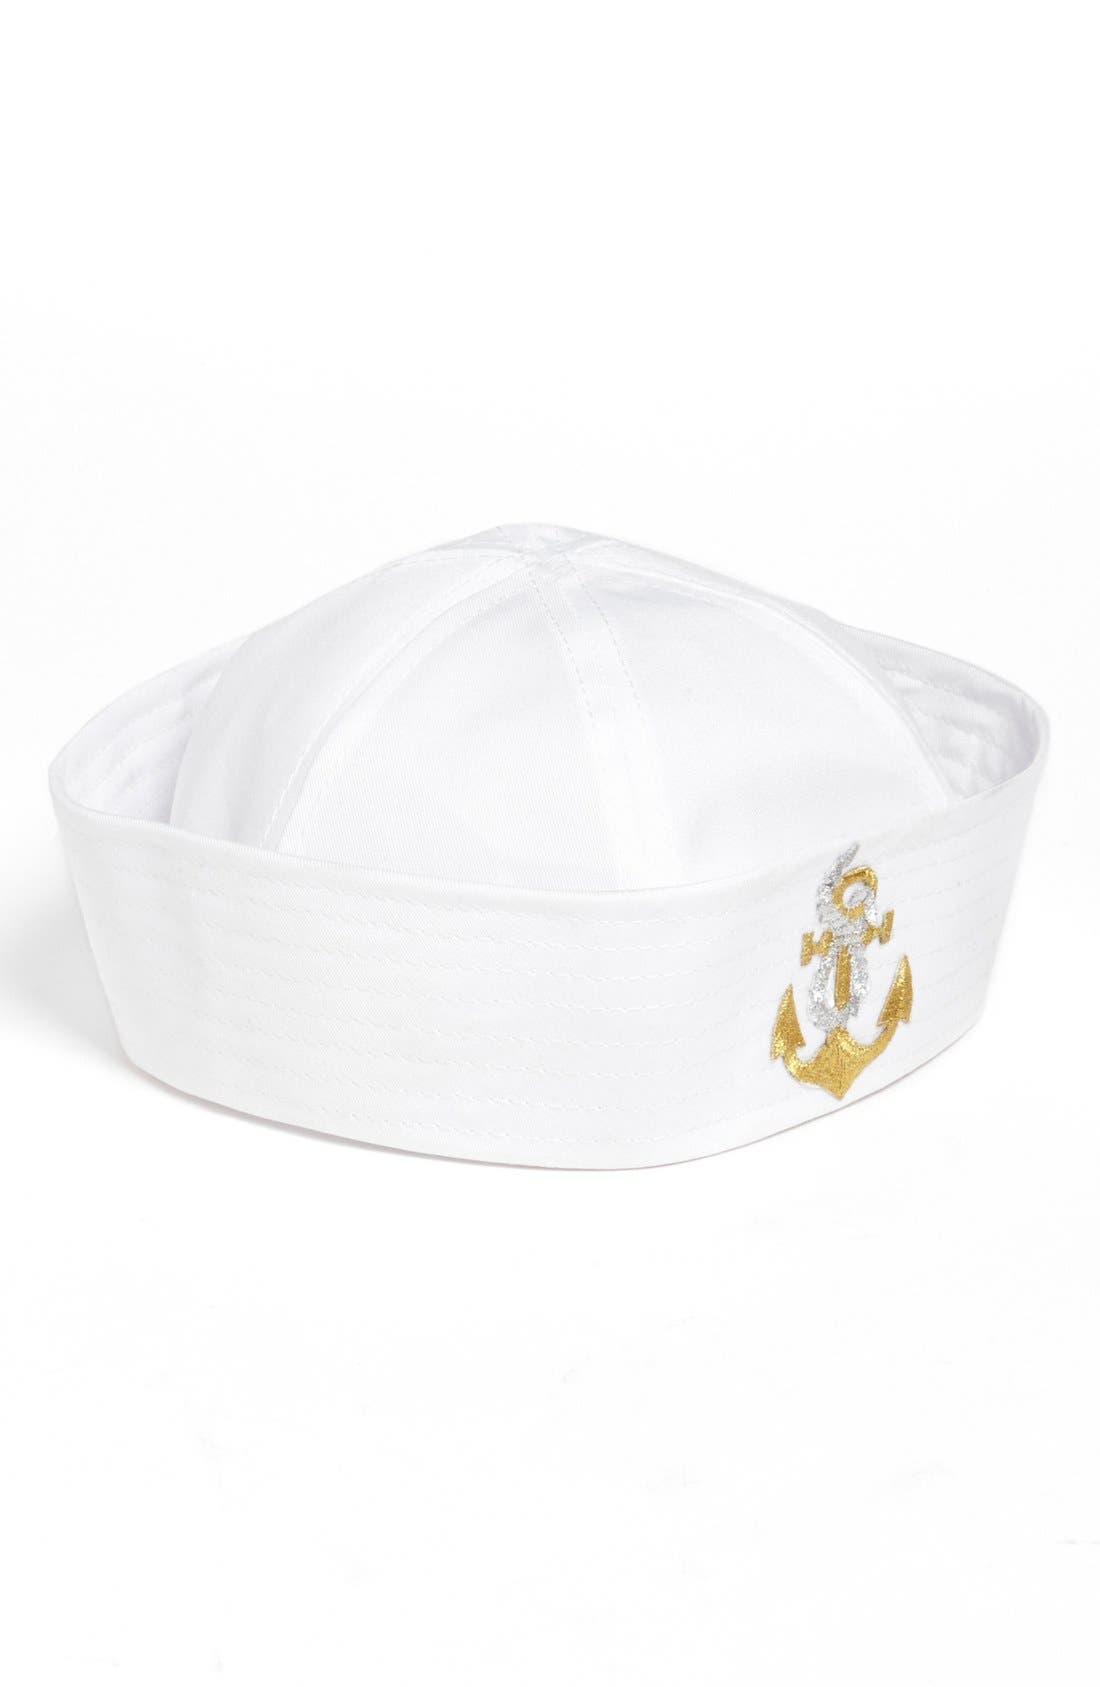 LULU, Sailor Hat, Main thumbnail 1, color, 100